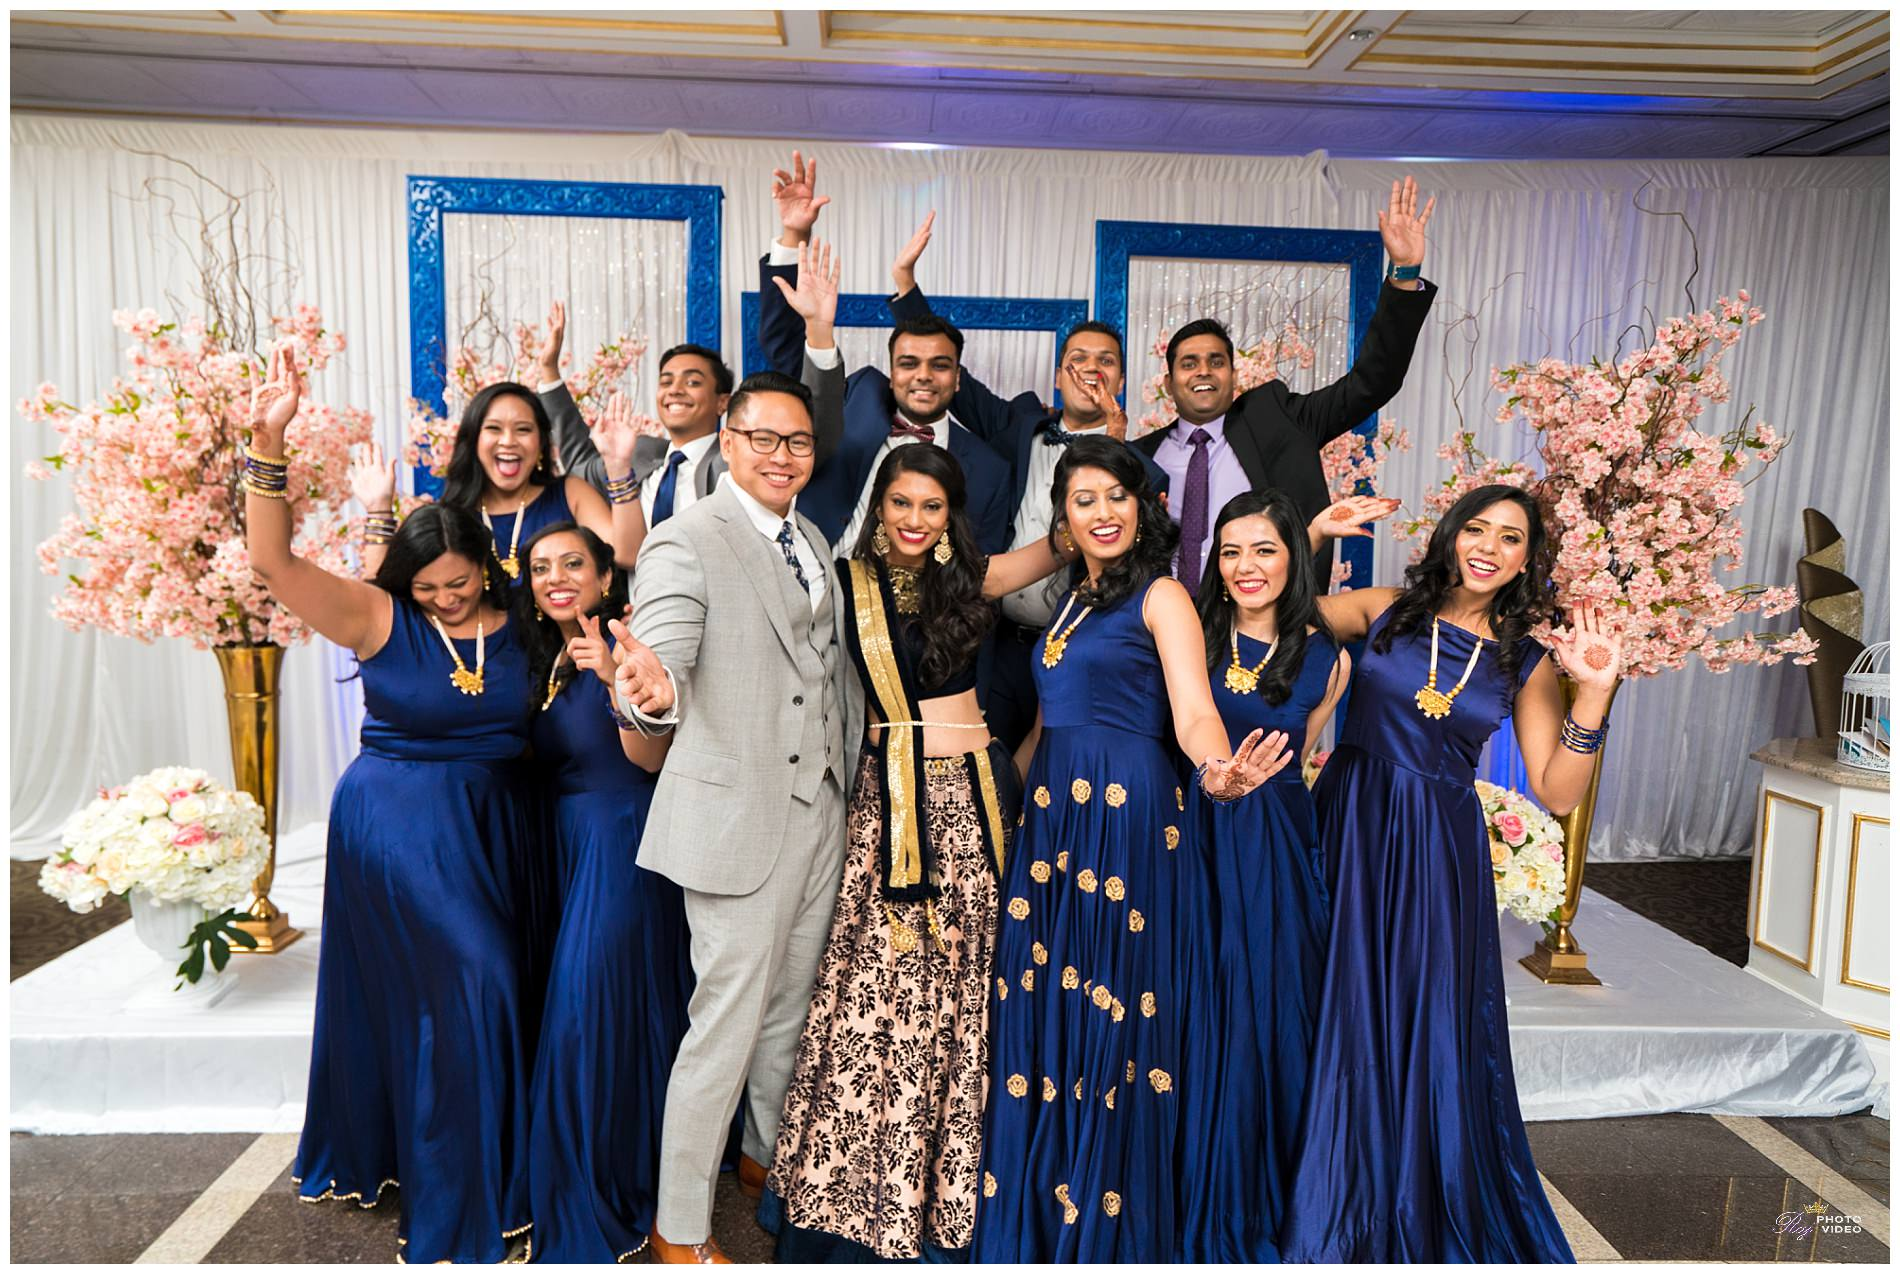 Royal-Manor-Garfield-NJ-Christian-Wedding-Ceremony-Khusbu-Jeff-71.jpg